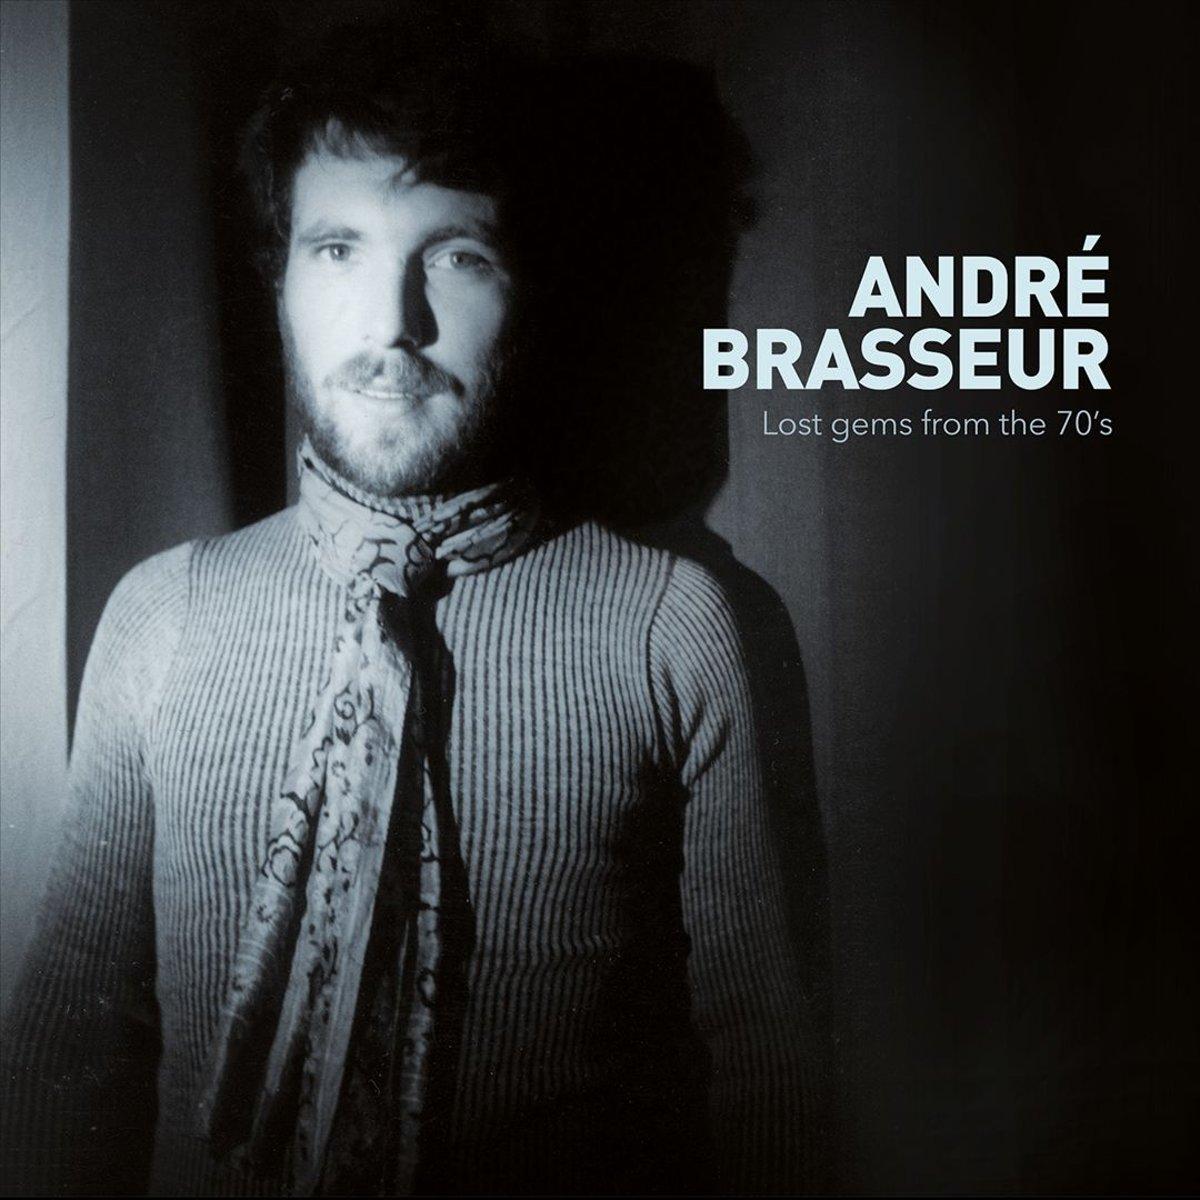 pics Paul-Andre Brasseur